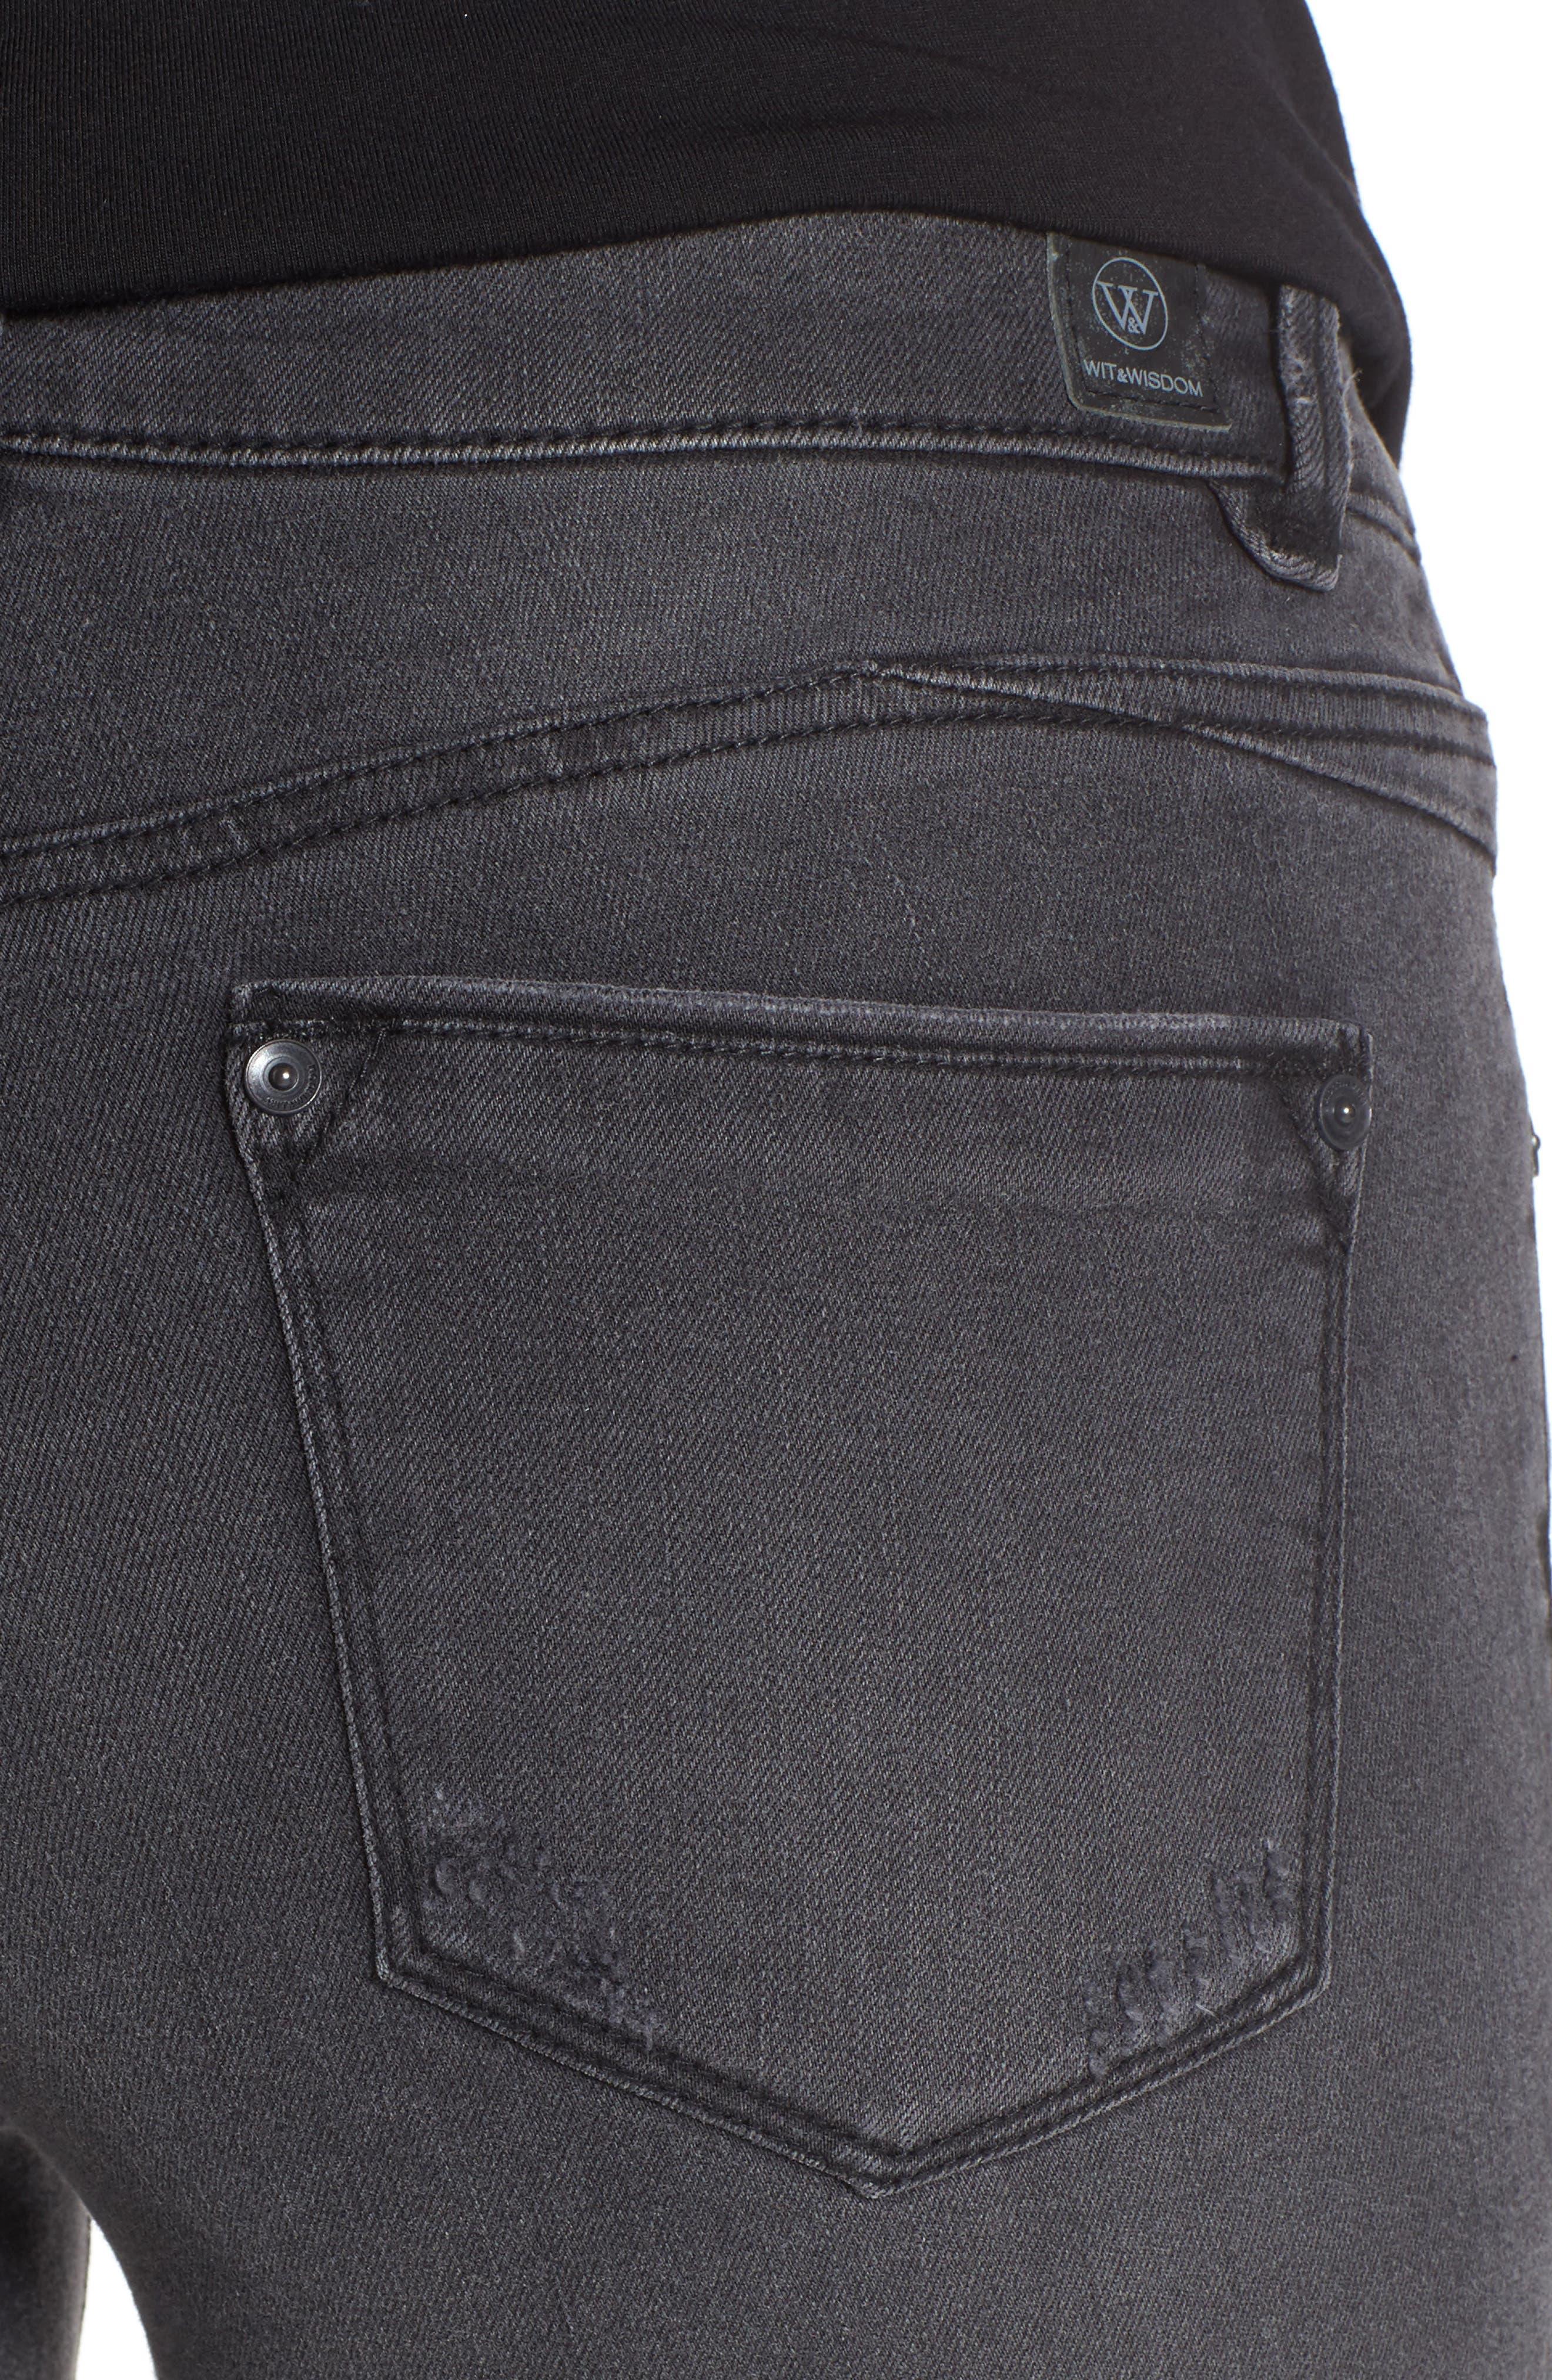 Skinny Ankle Jeans,                             Alternate thumbnail 4, color,                             020